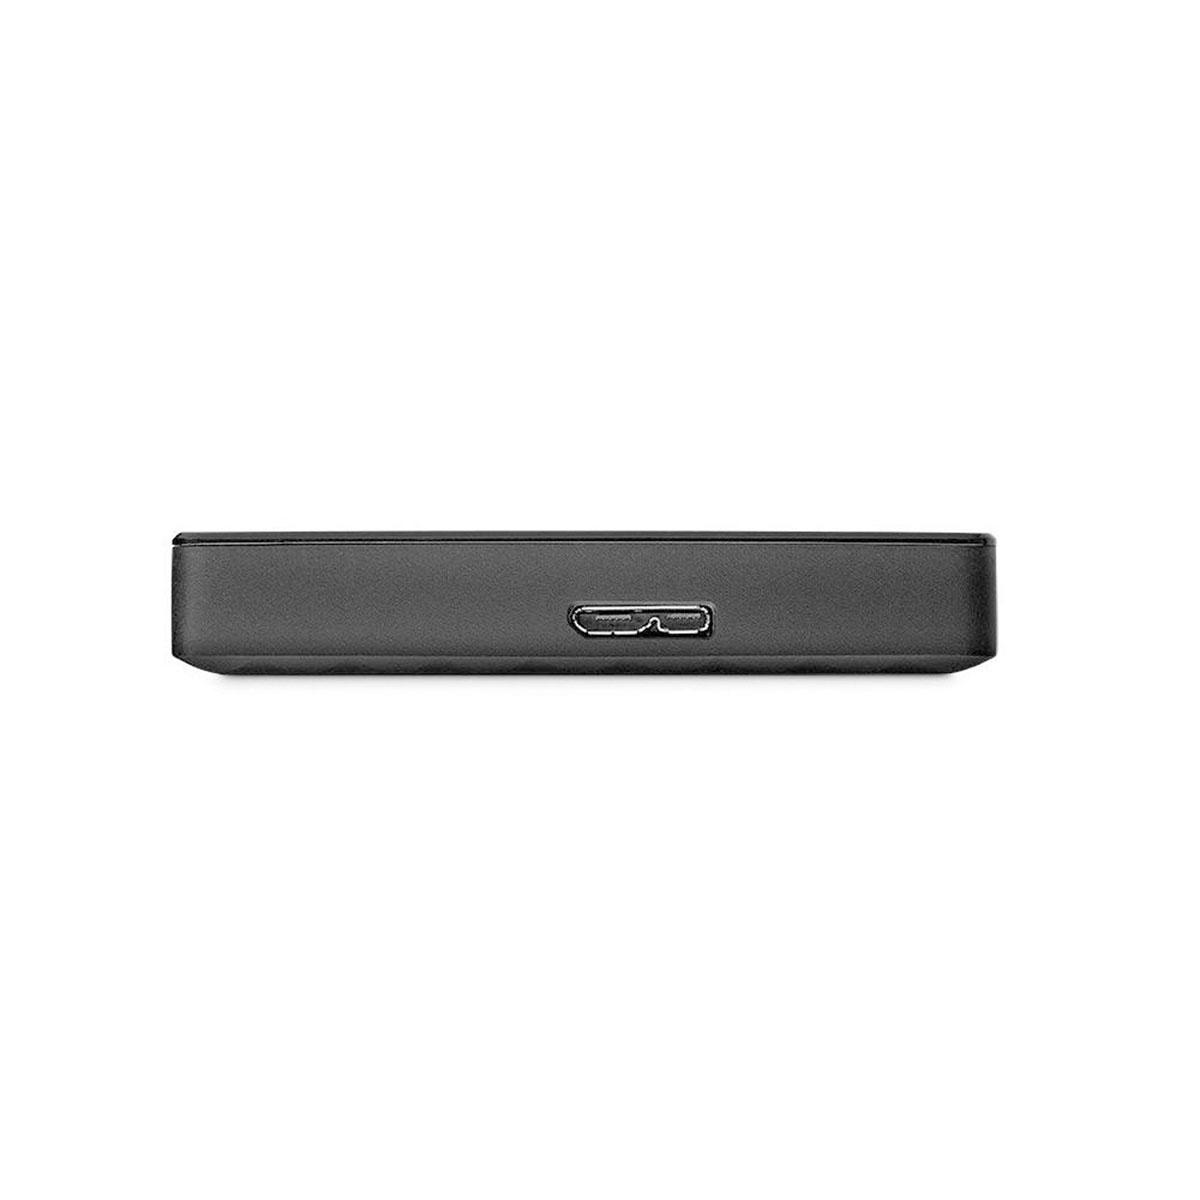 "HD Externo Portátil Seagate Expansion 1TB USB 3.0 5400 RPM 2.5"" - STEA1000400"